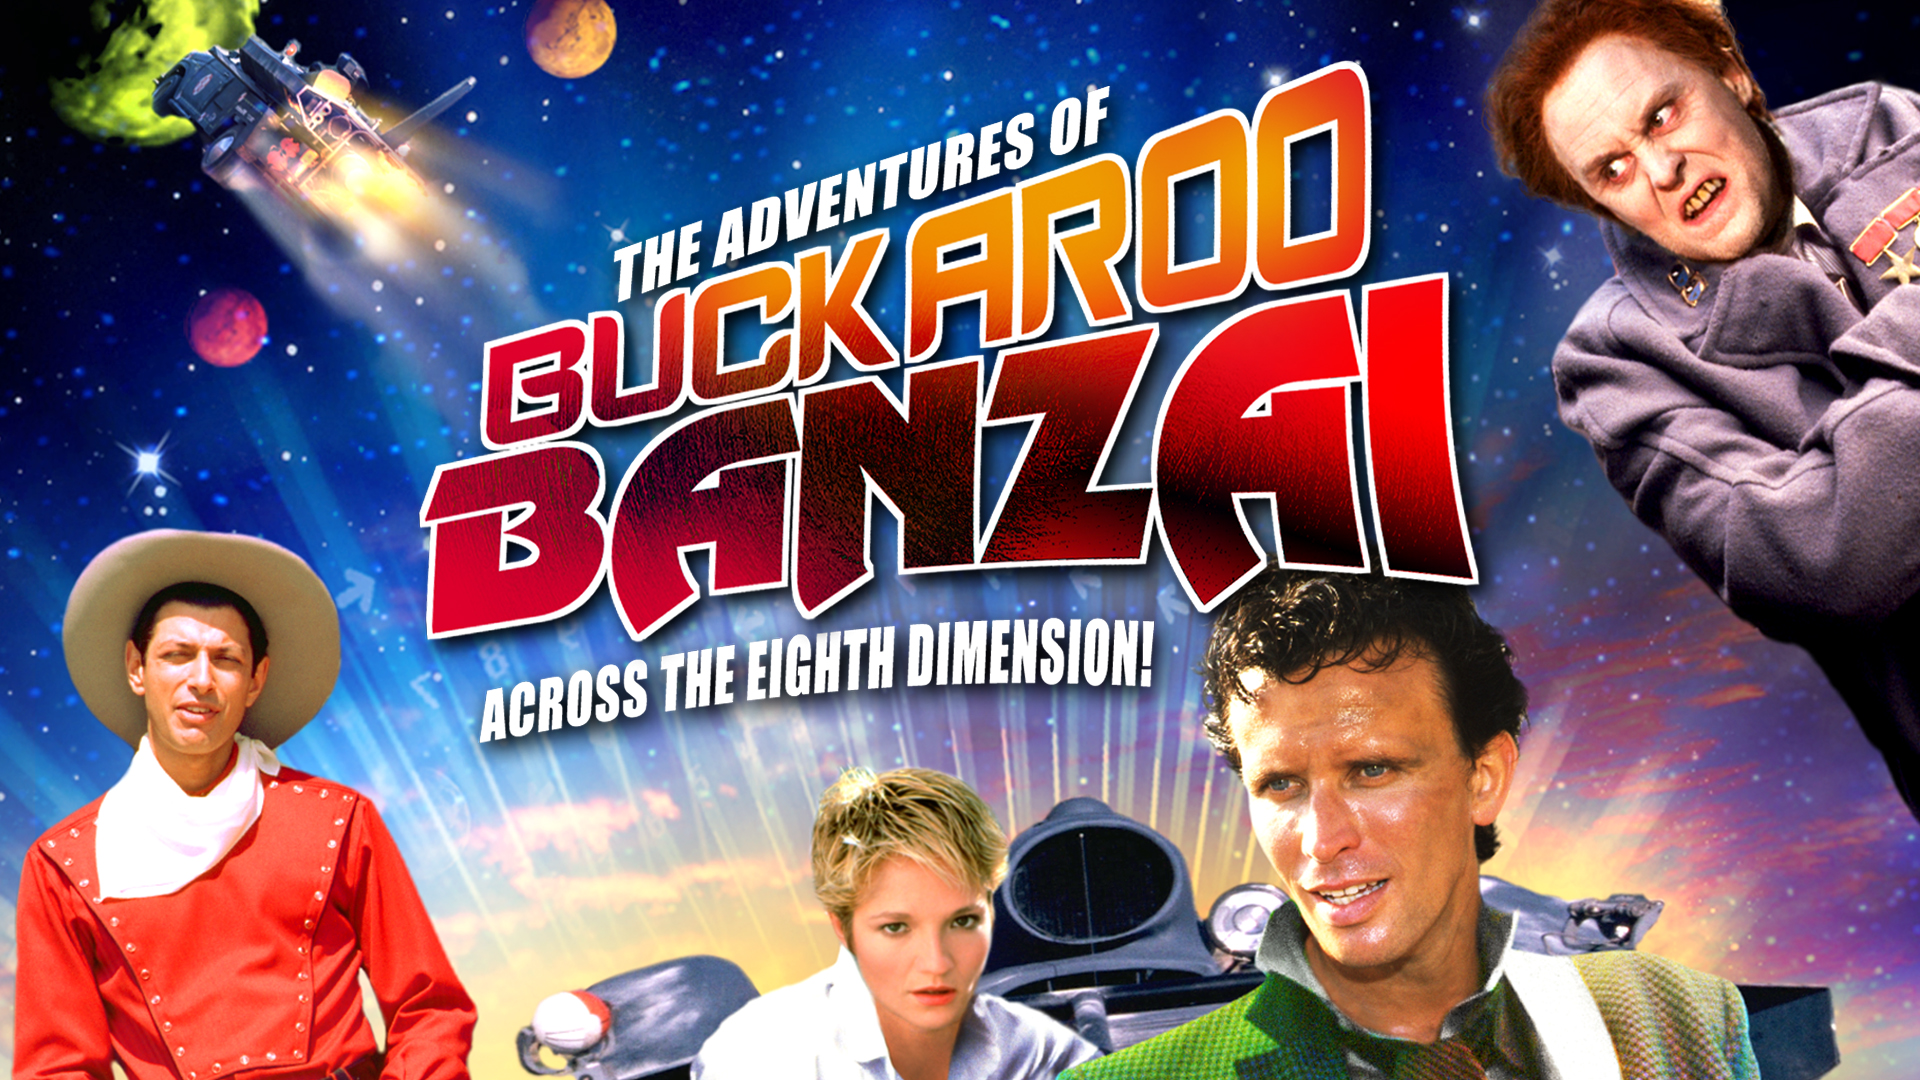 Amazoncom Watch The Adventures of Buckaroo Banzai Prime Video 1920x1080